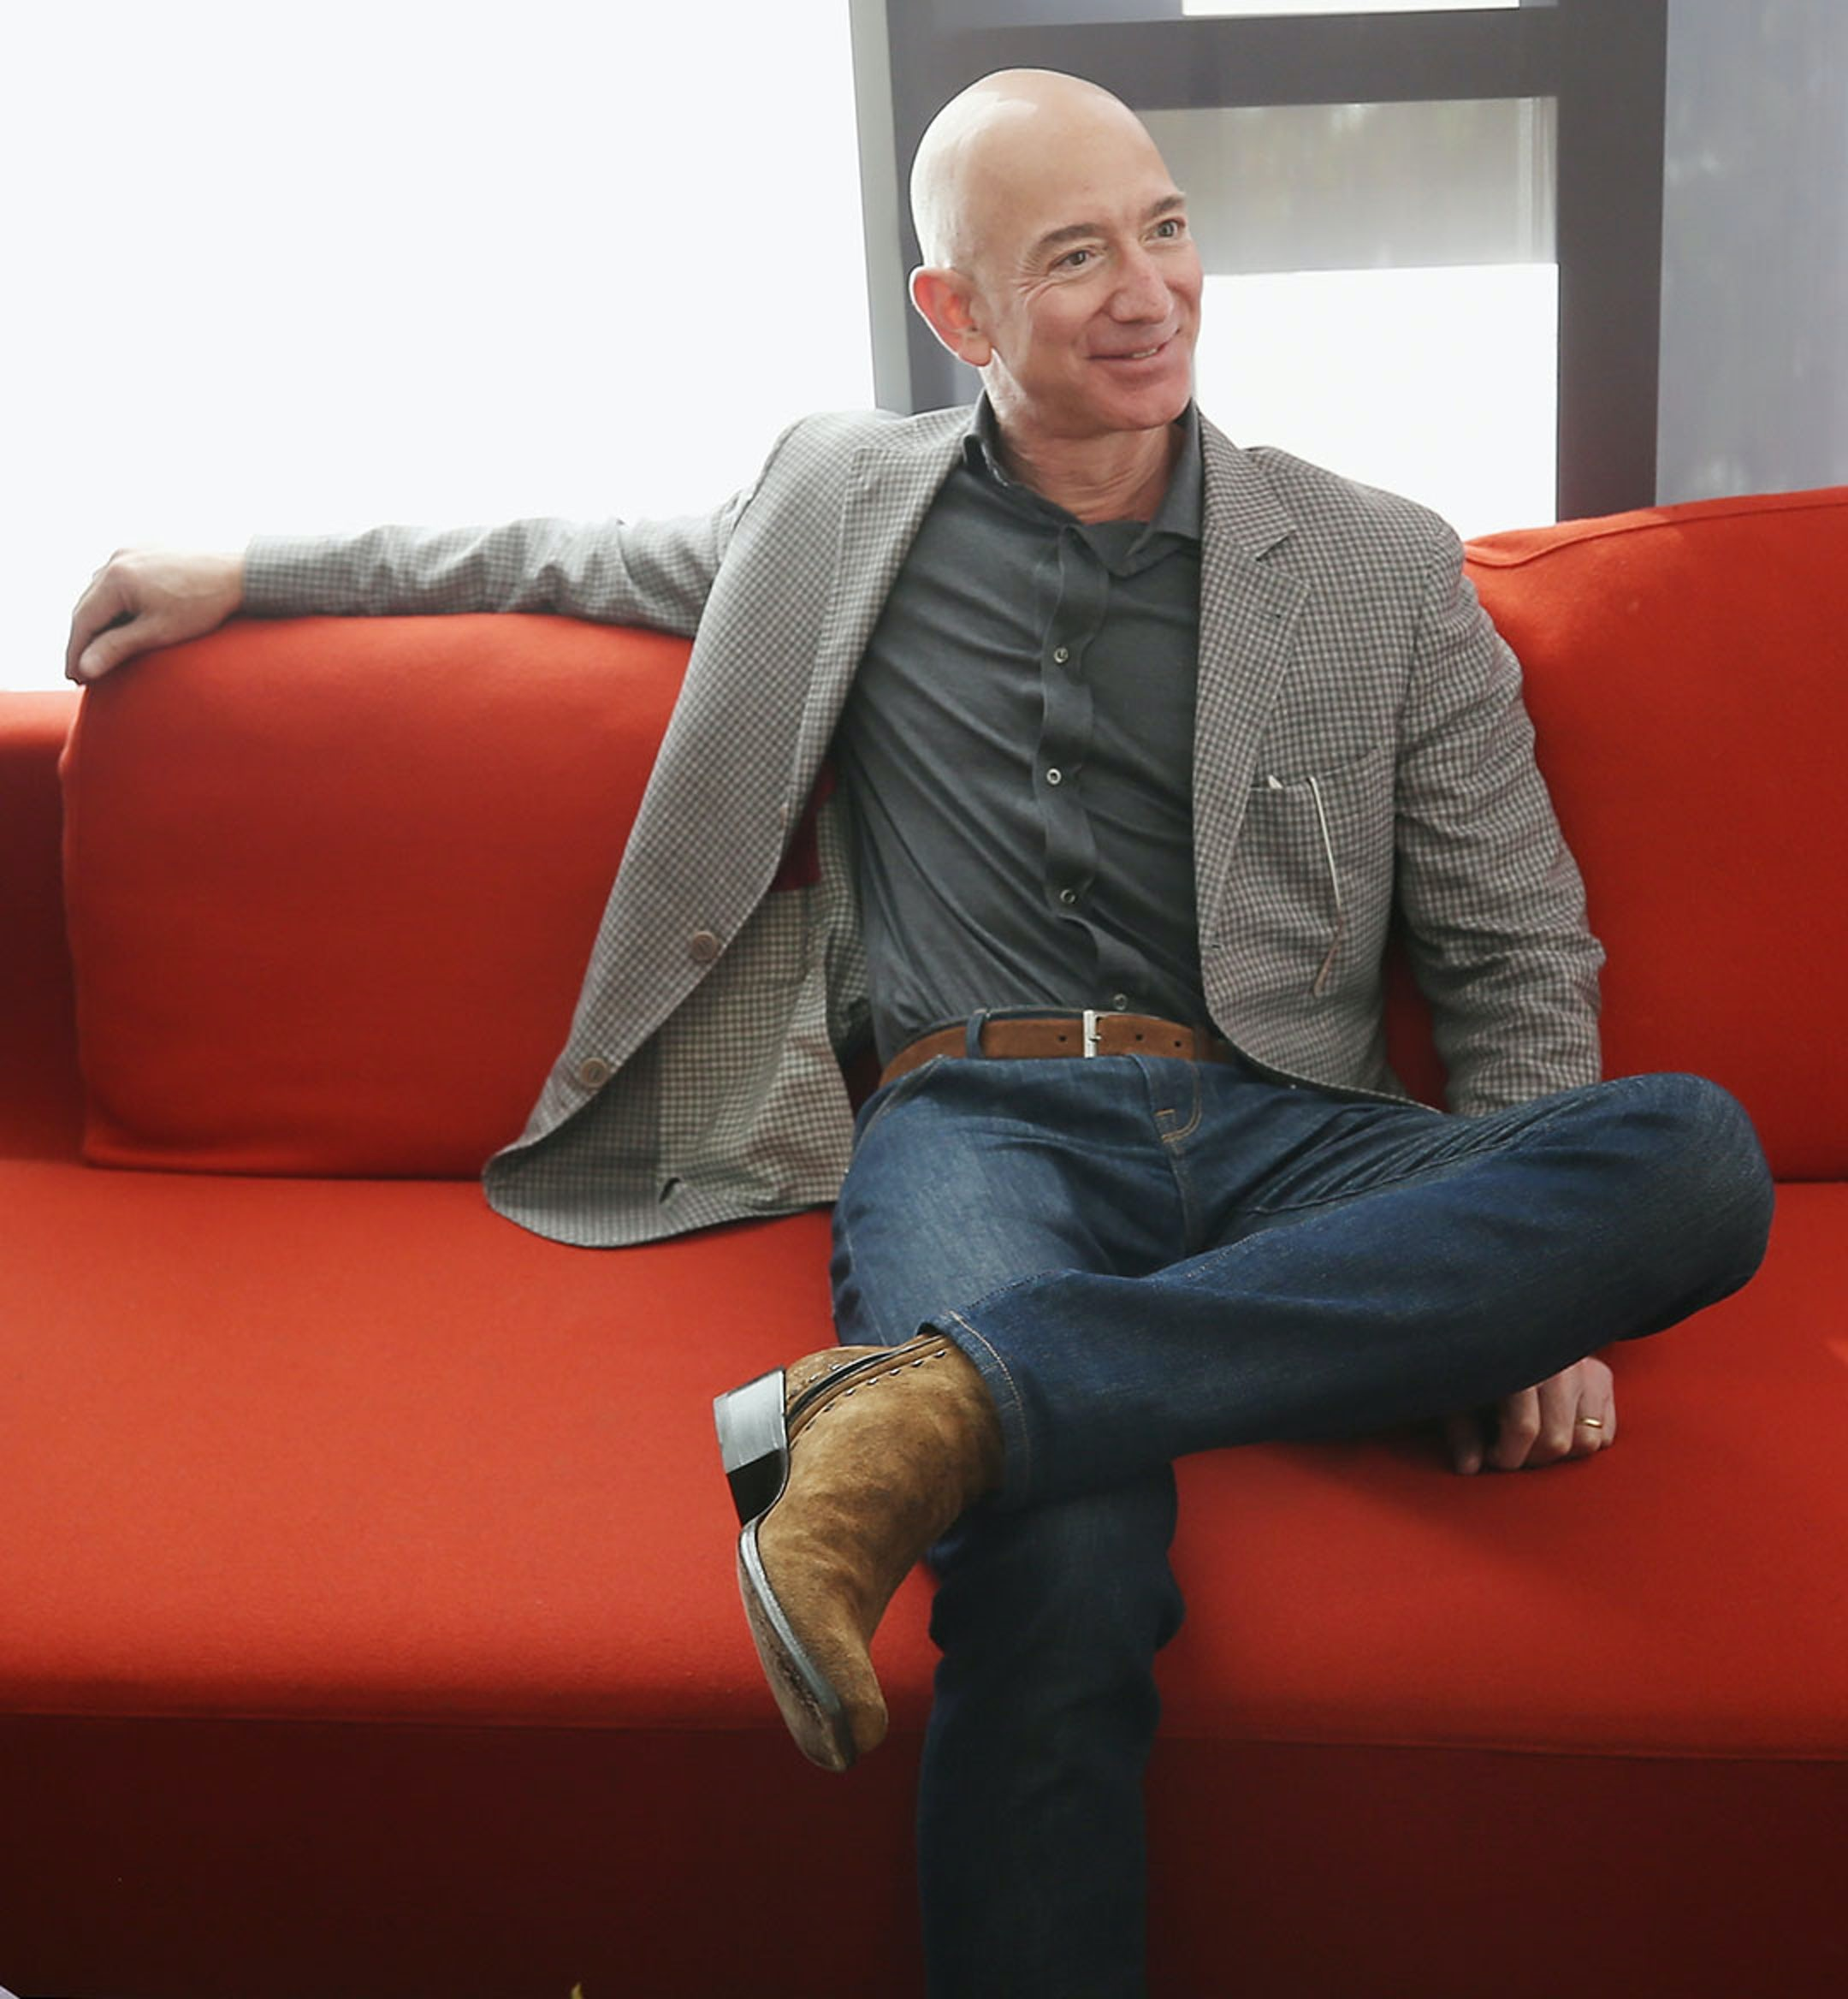 Jeff Bezos Mobile Hero Imaeg 1080x1168 0